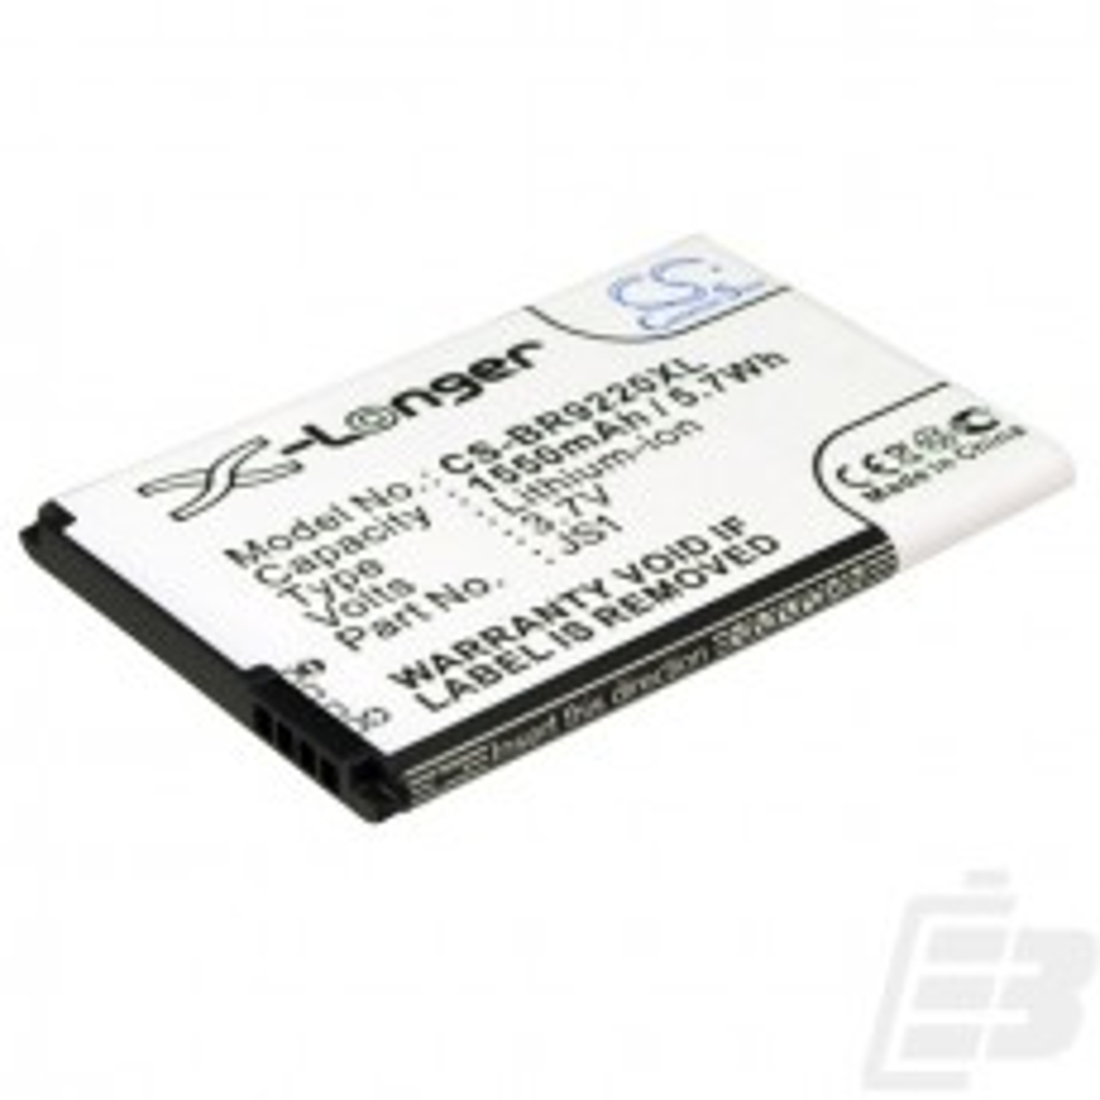 Smartphone battery Blackberry Curve 9320_1